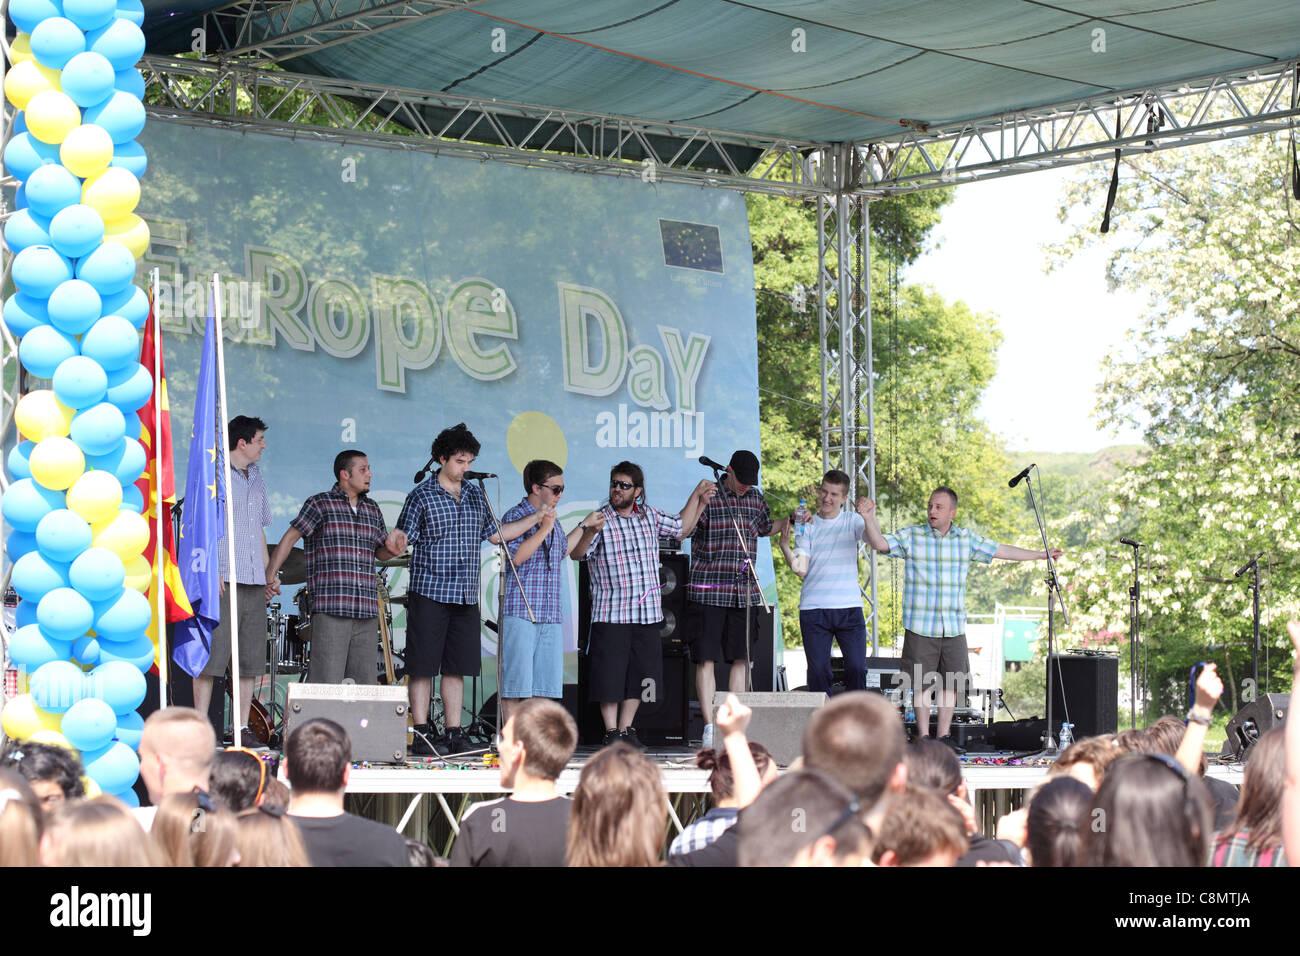 SUPERHIKS performs on EuropeDay celebration in the City Park in Skopje, Macedonia - Stock Image